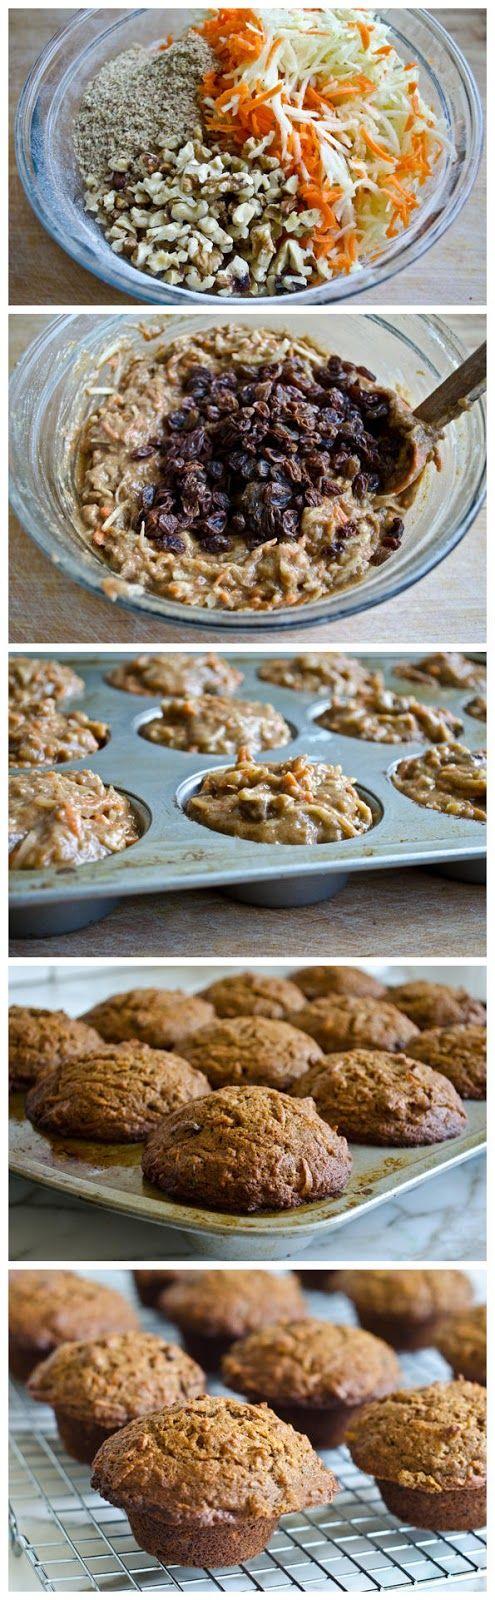 Start Recipes: Morning Glory Muffins